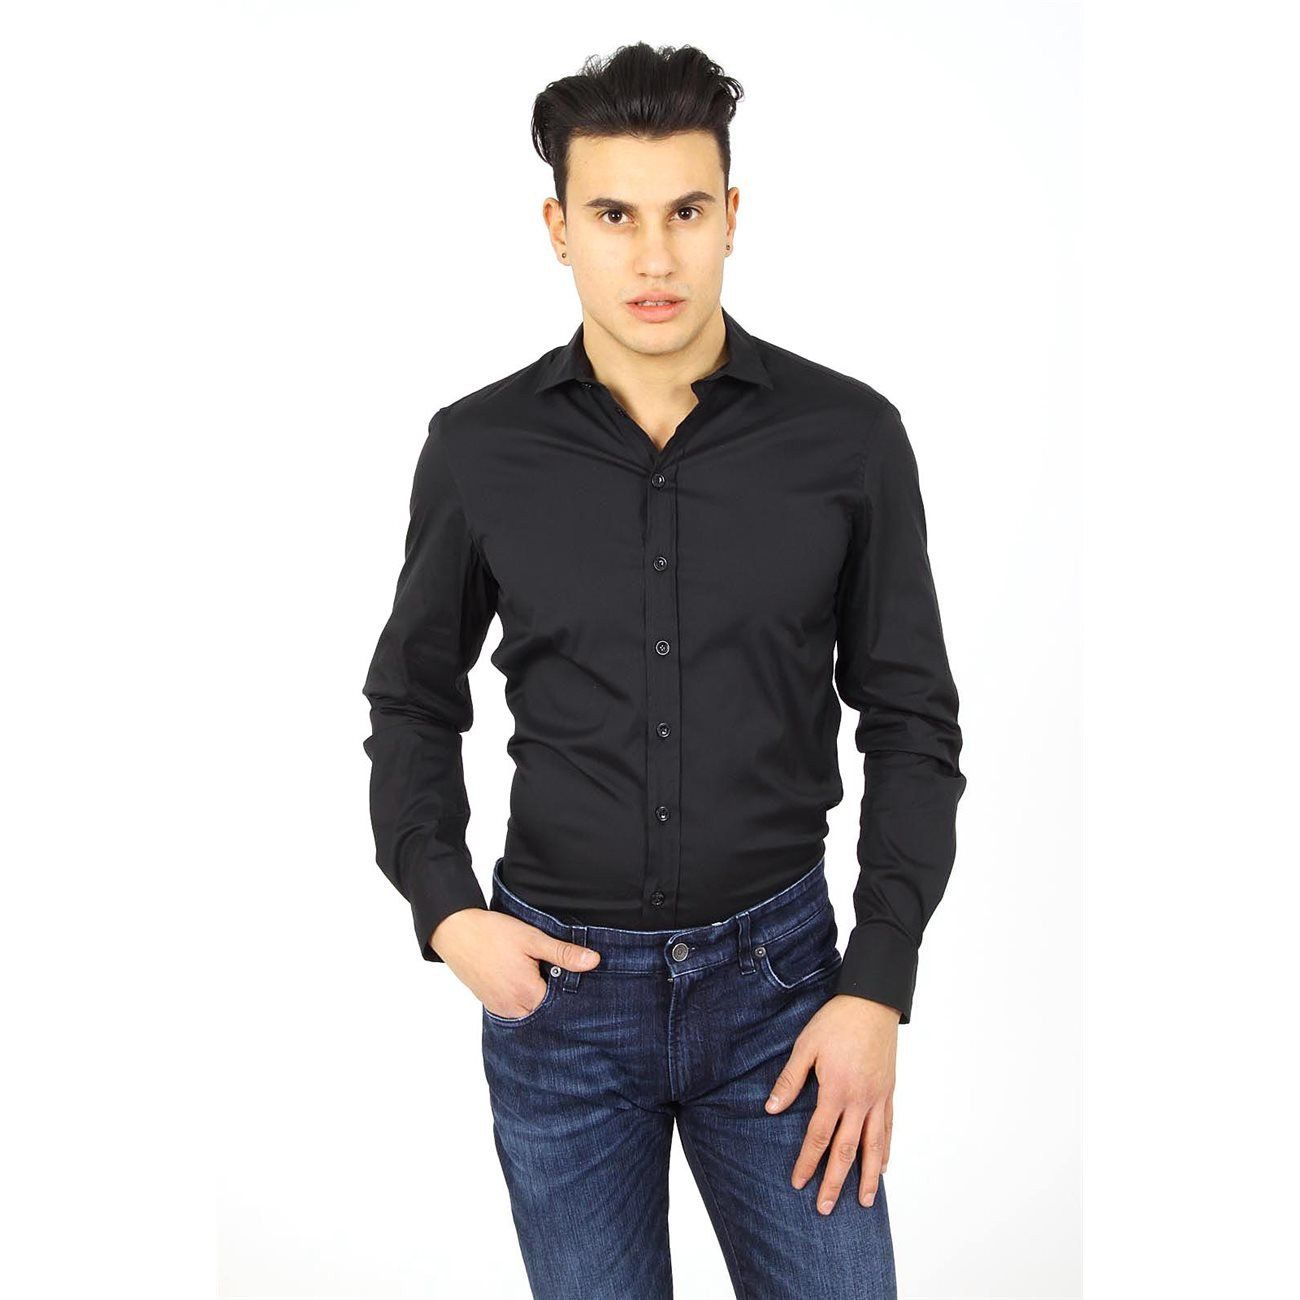 Armani Collezioni Mens Shirt Long Sleeve Rcssdl Rc0f0 999 Armani